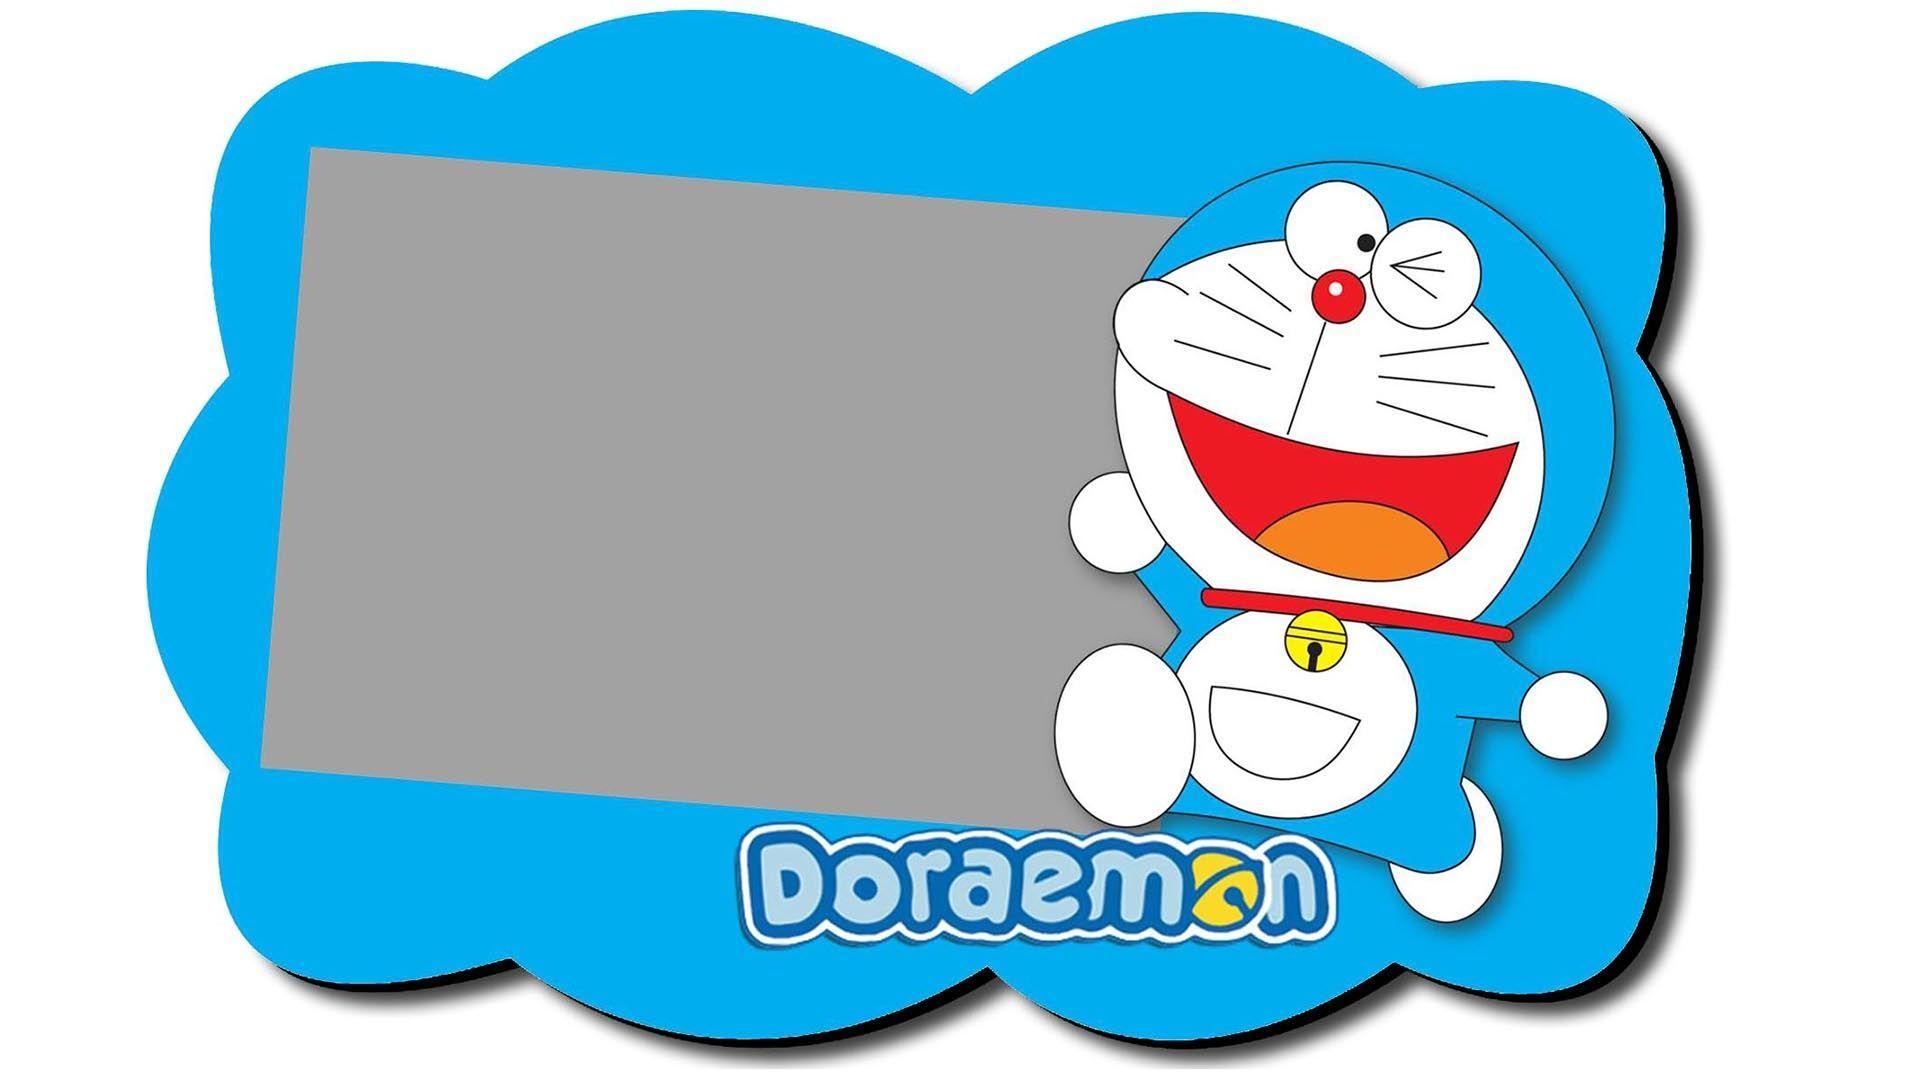 Doraemon Wallpaper - Doraemon Birthday Card Template (#80494) - HD ...